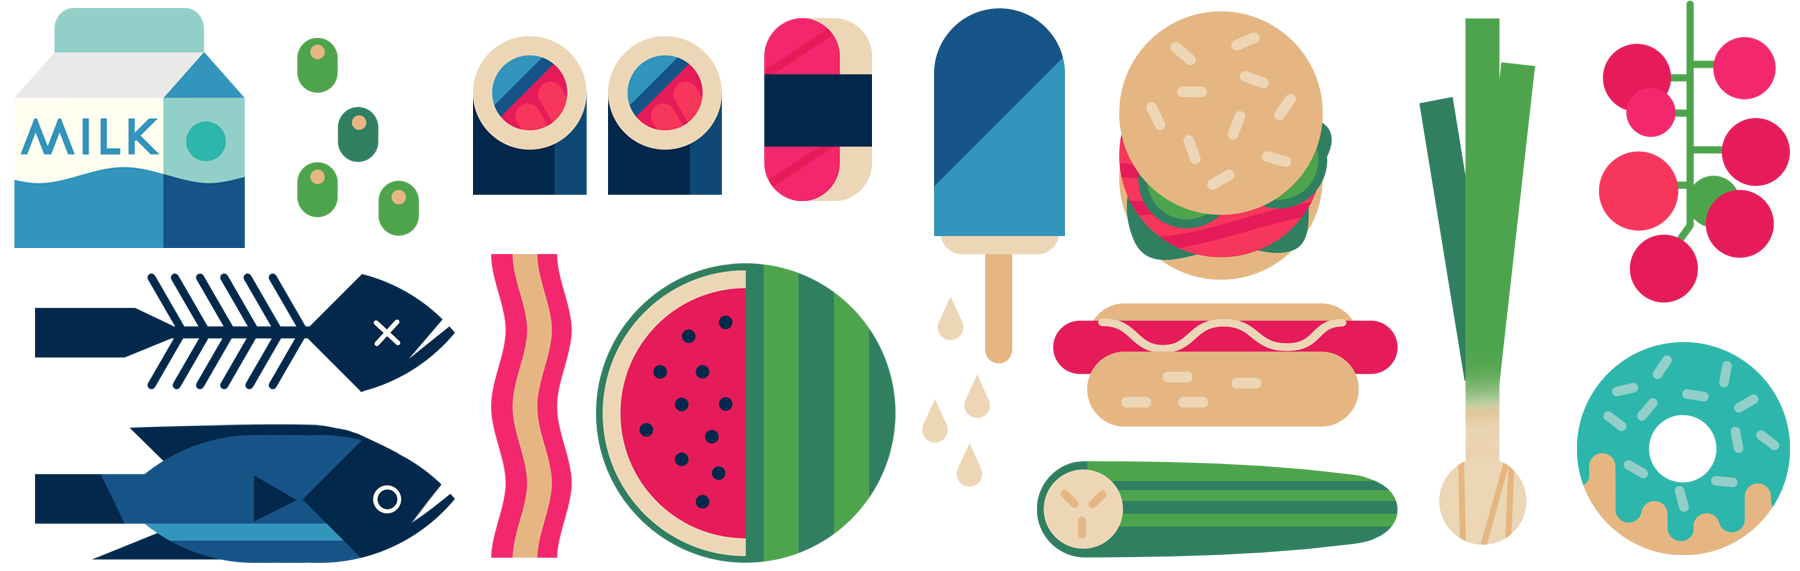 Food-Benecol-Animation-Advert-Advertising-Illustration-Owen-Davey_o.png